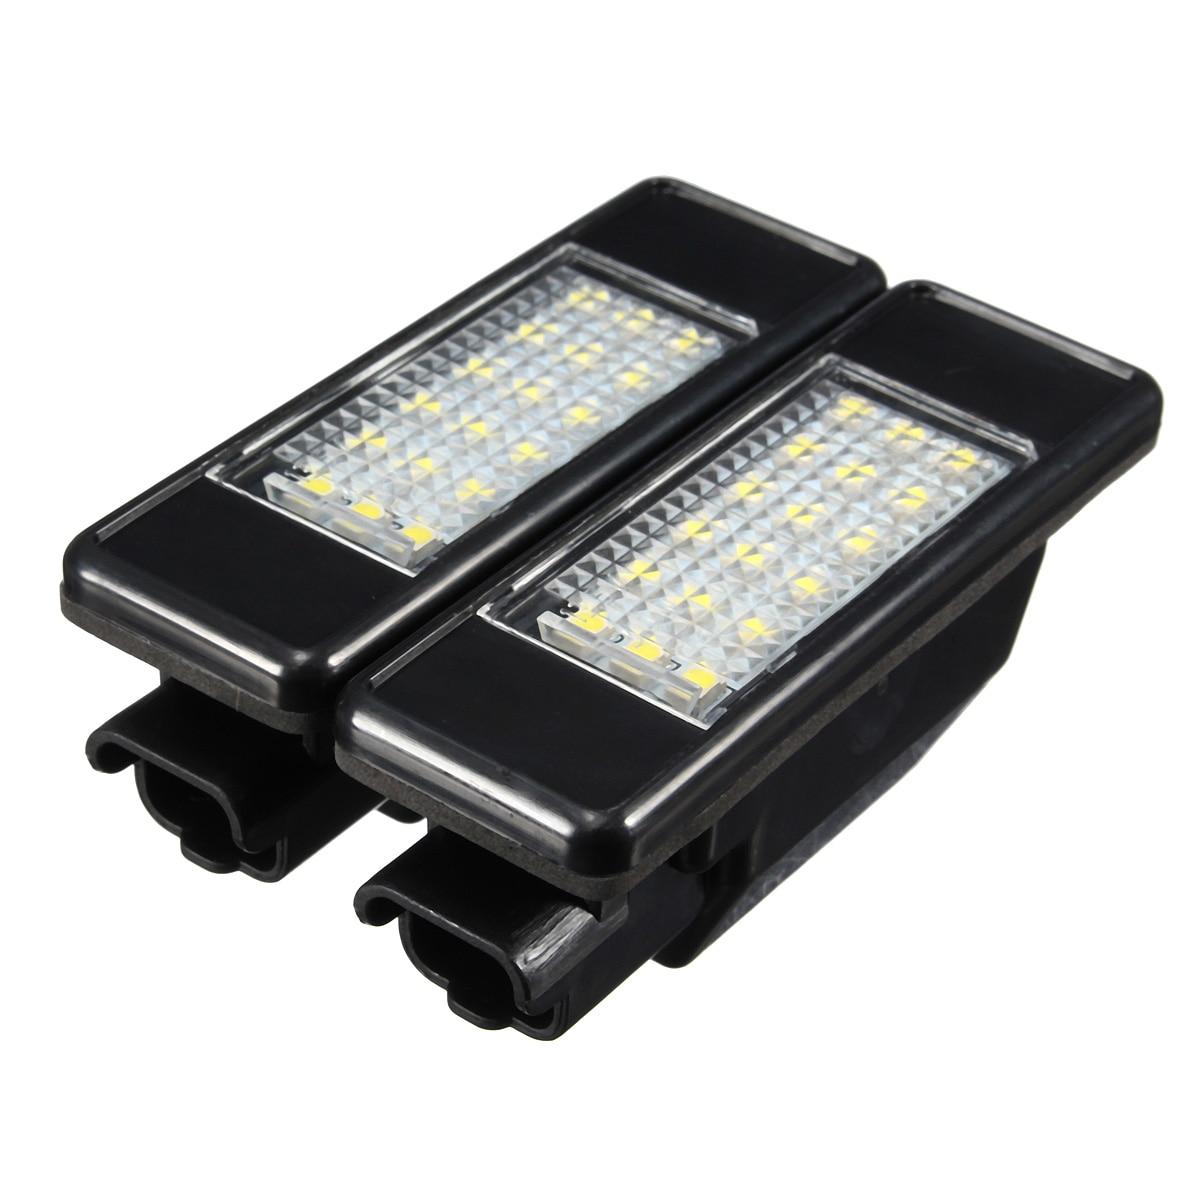 2X Car Rear 18 LED SMD License Number Plate Light Lamp 6000K For Peugeot 106 207 307 308 406 407 508 For CITROEN C3 C4 C5 C6 C8